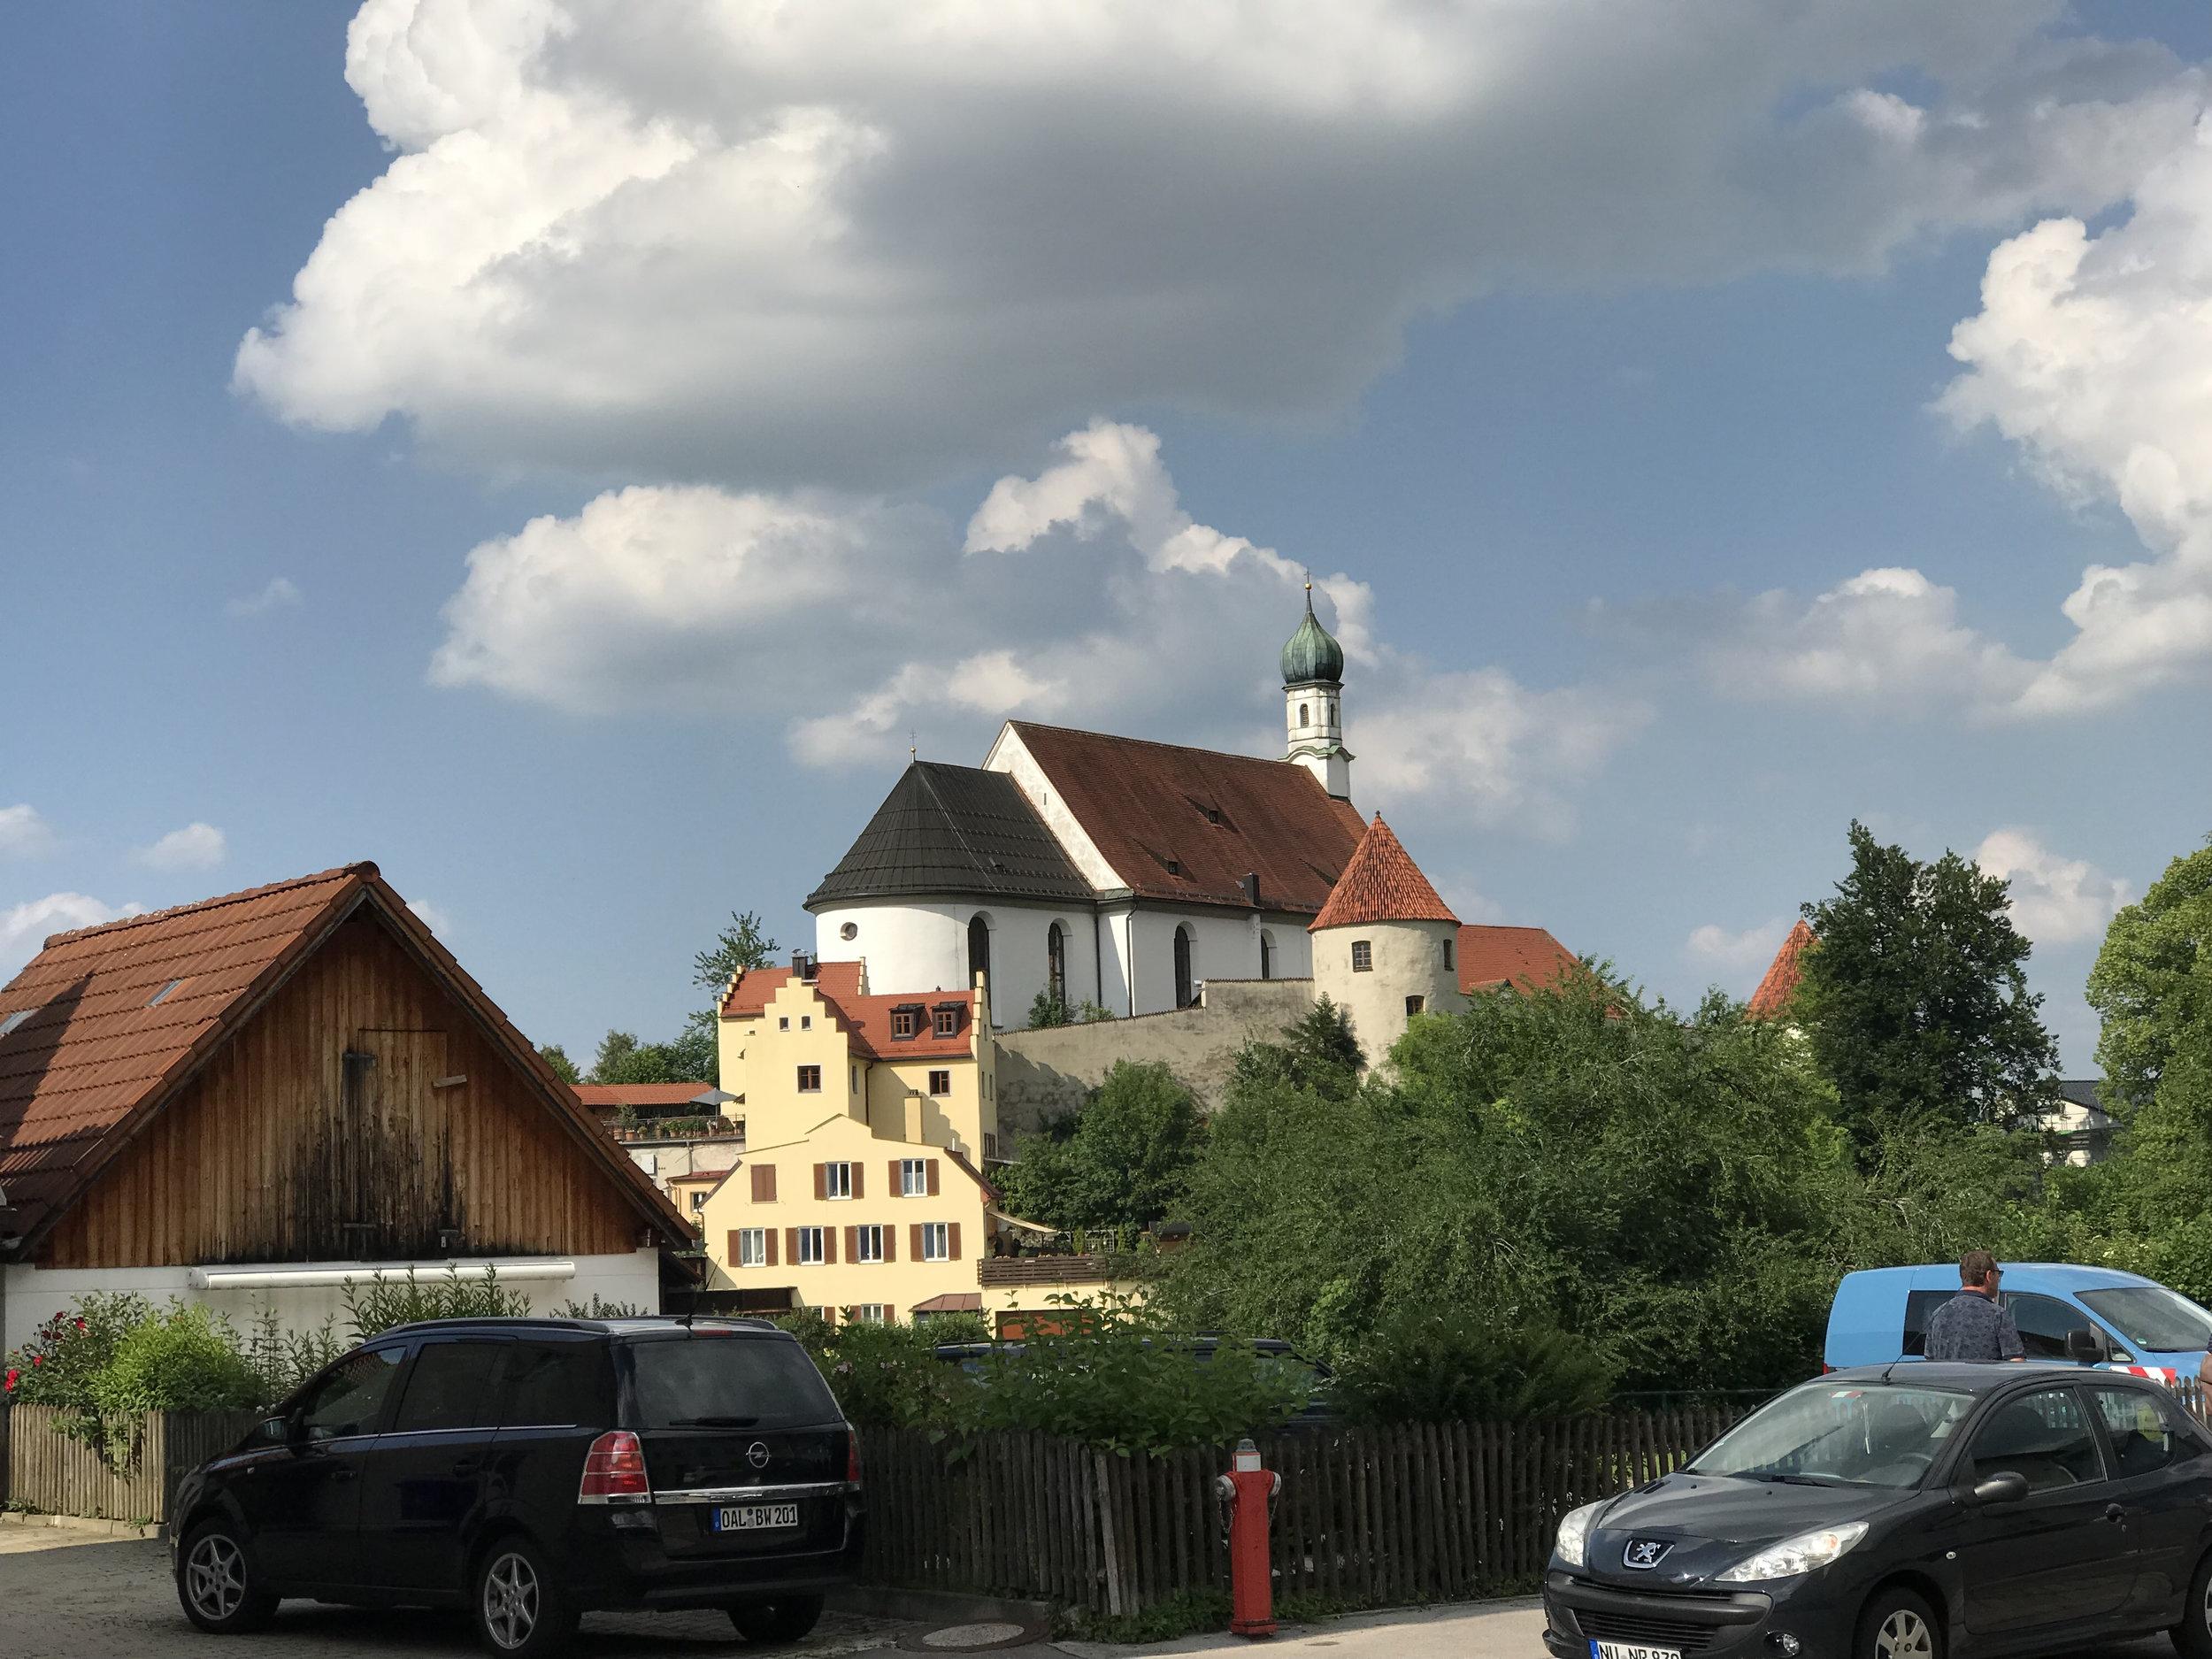 Teri_Day2_Castles_Germany&Austria_spiritedtable_photo02.jpg